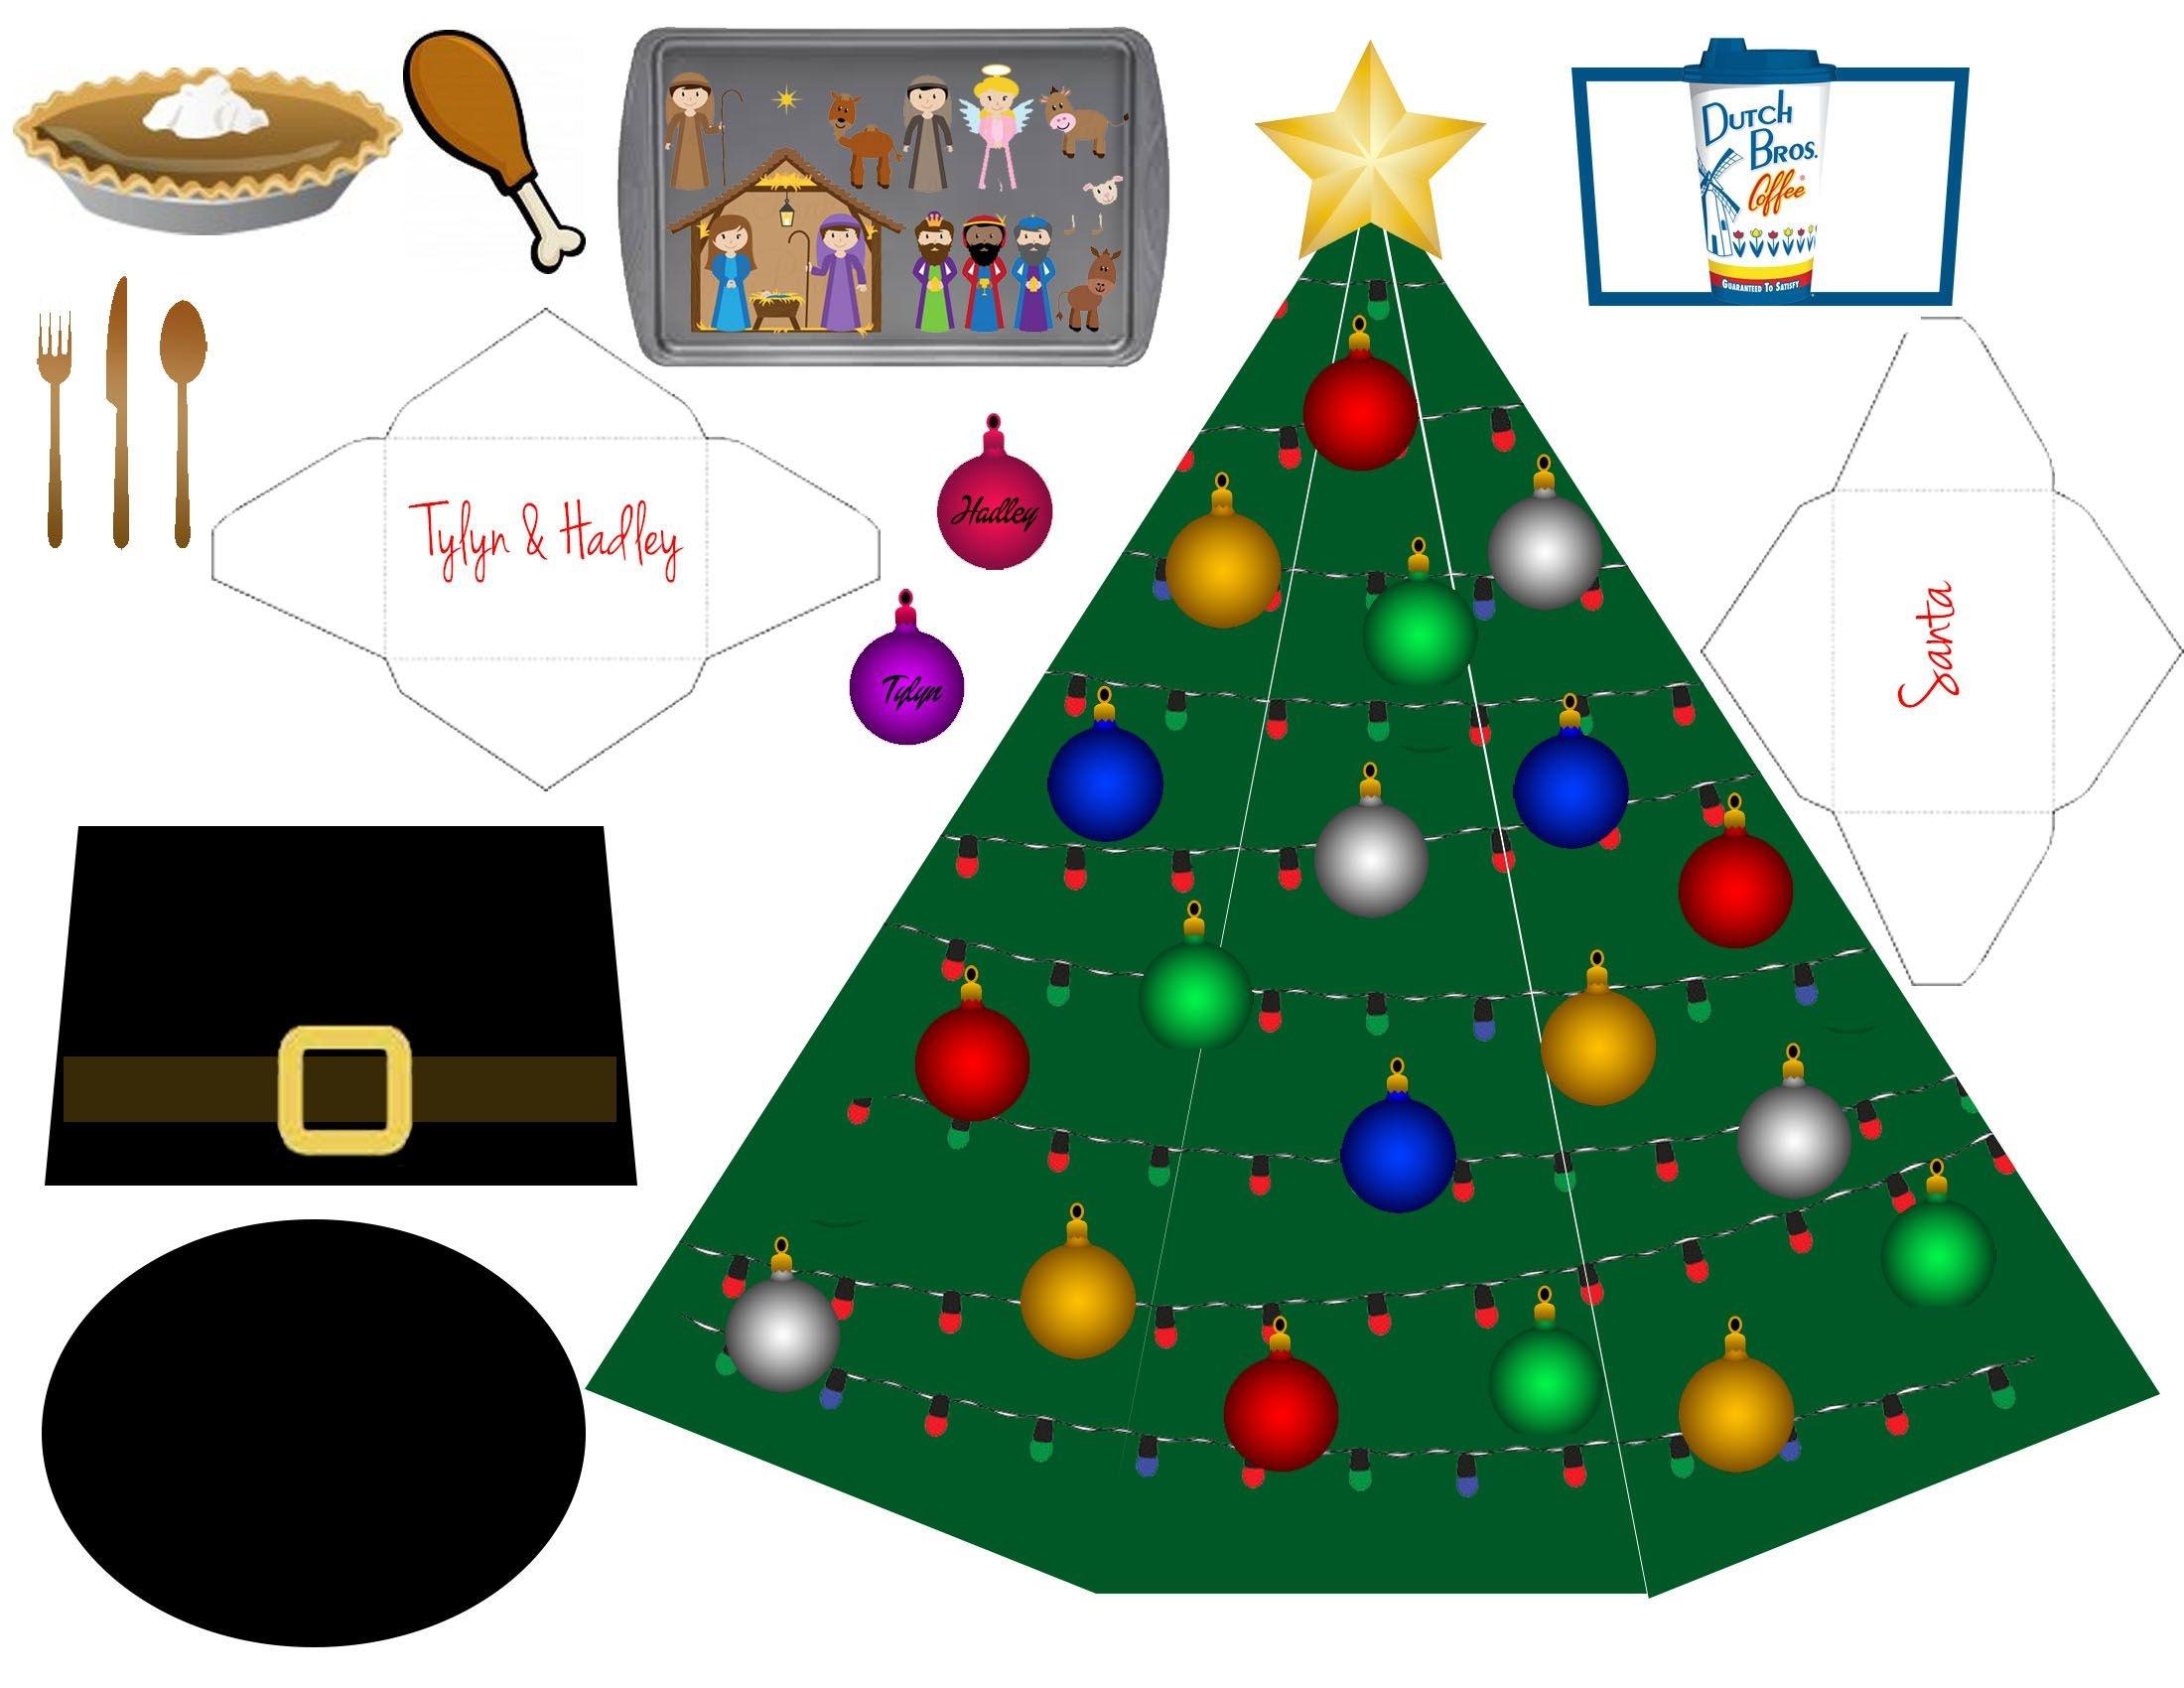 Elf On The Shelf Free Printable Props | Christmas | Elf On Shelf - Elf On The Shelf Printable Props Free